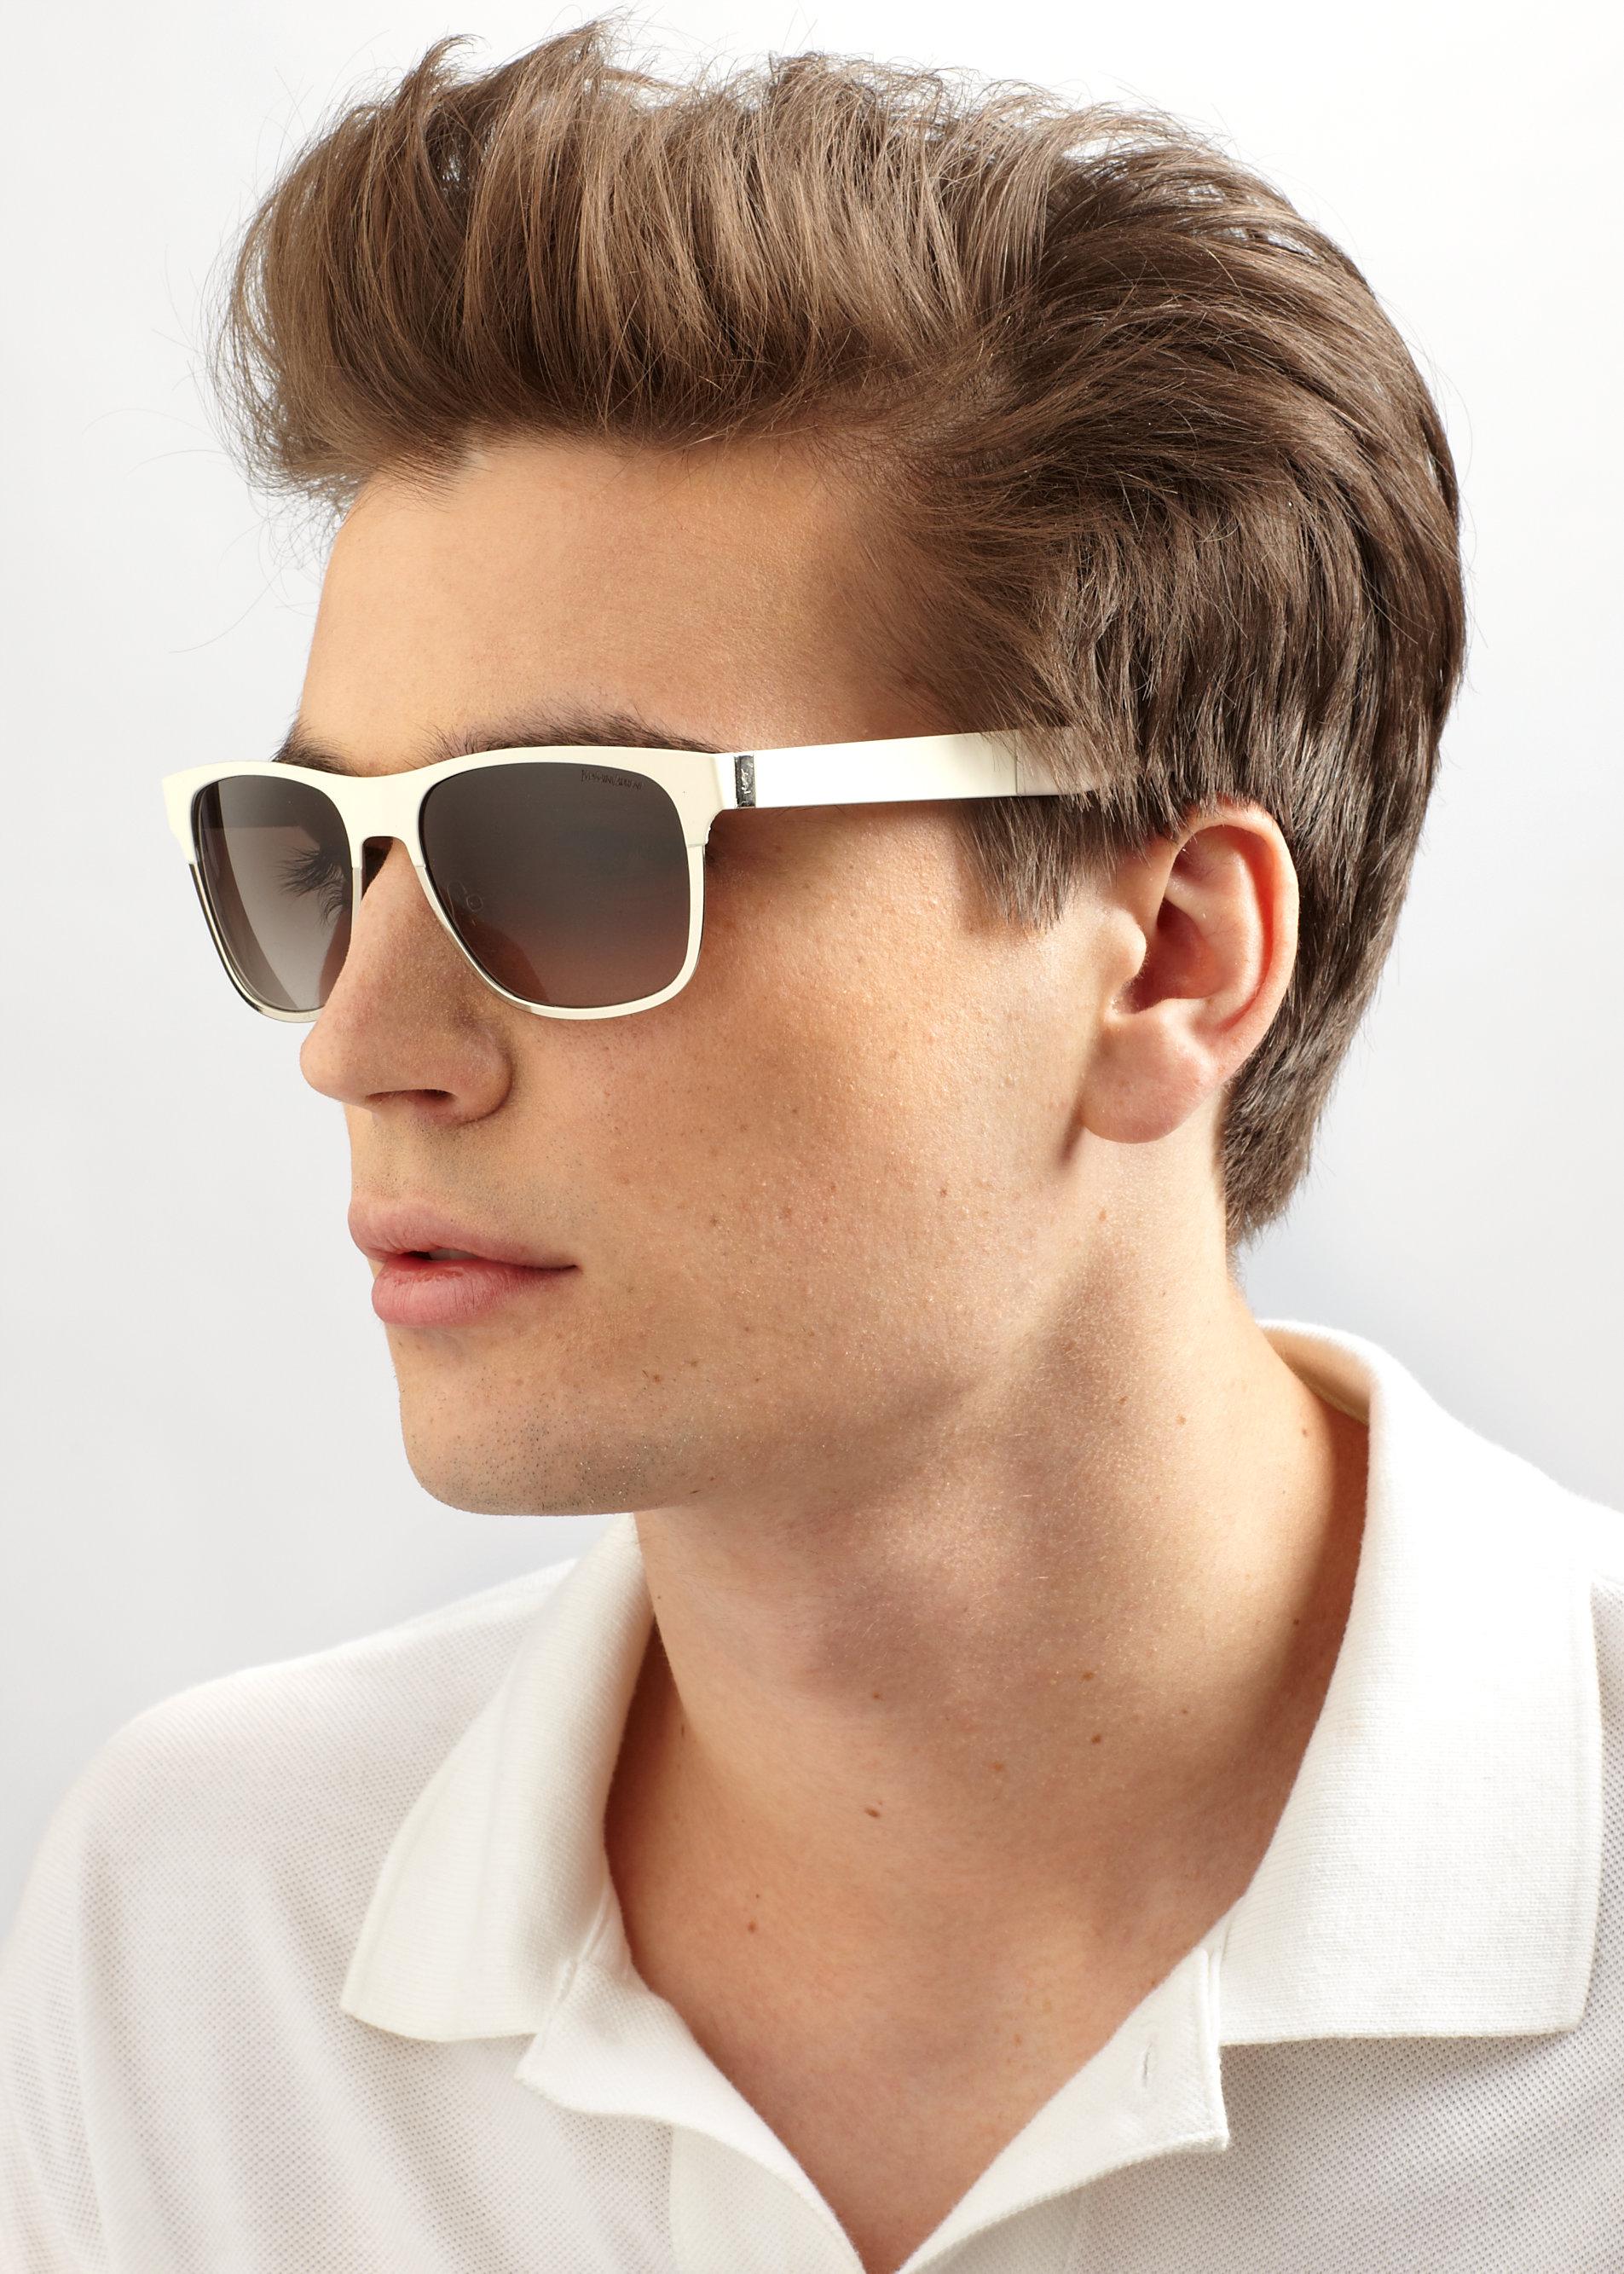 441f1c2a014 Lyst - Saint Laurent Metal Rectangular Sunglasses in White for Men